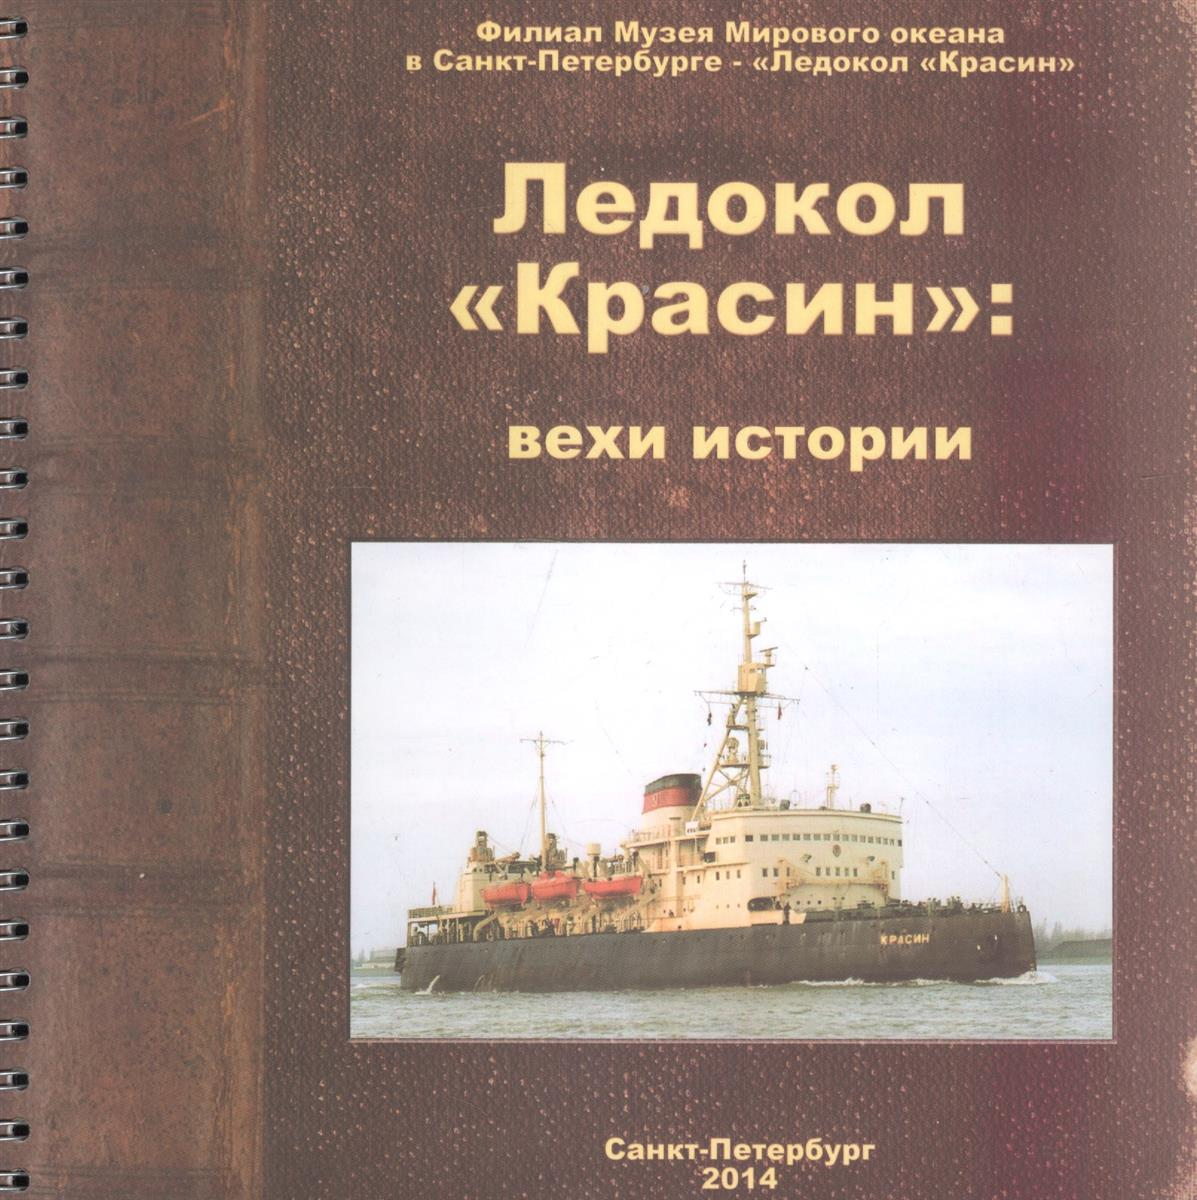 Емелина М., Савинов М. Ледокол Красин. Вехи истории